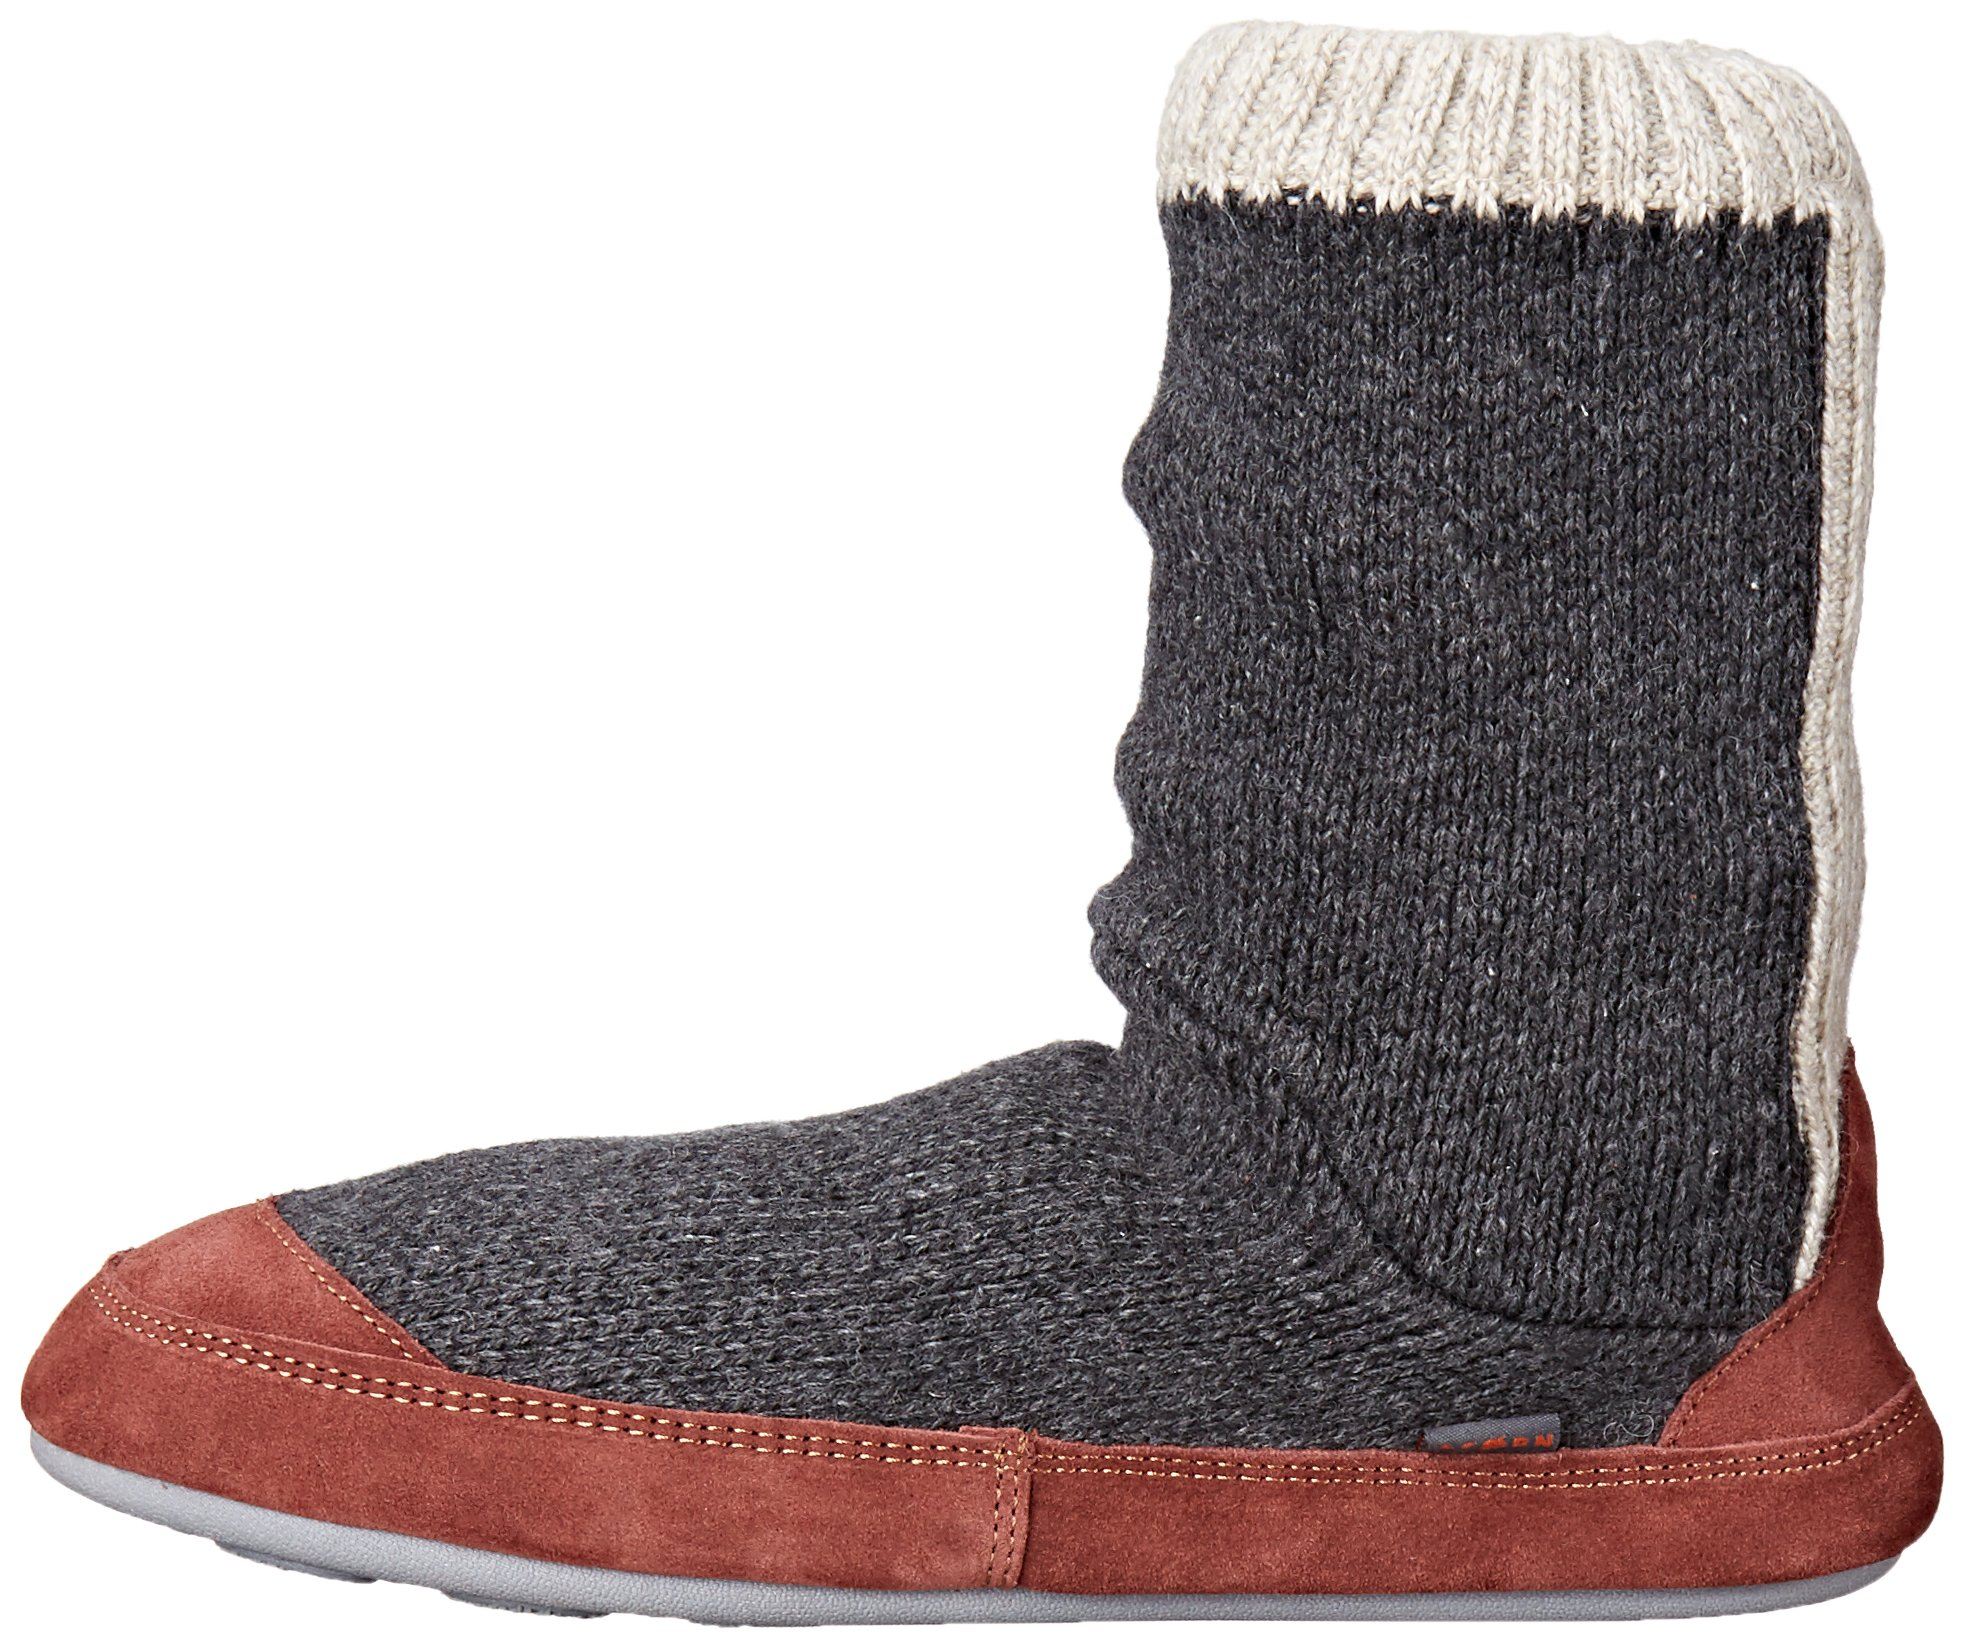 Acorn Men's Slouch Boot Slipper, Charcoal Ragg Wool, Medium/9-10 B US by Acorn (Image #5)